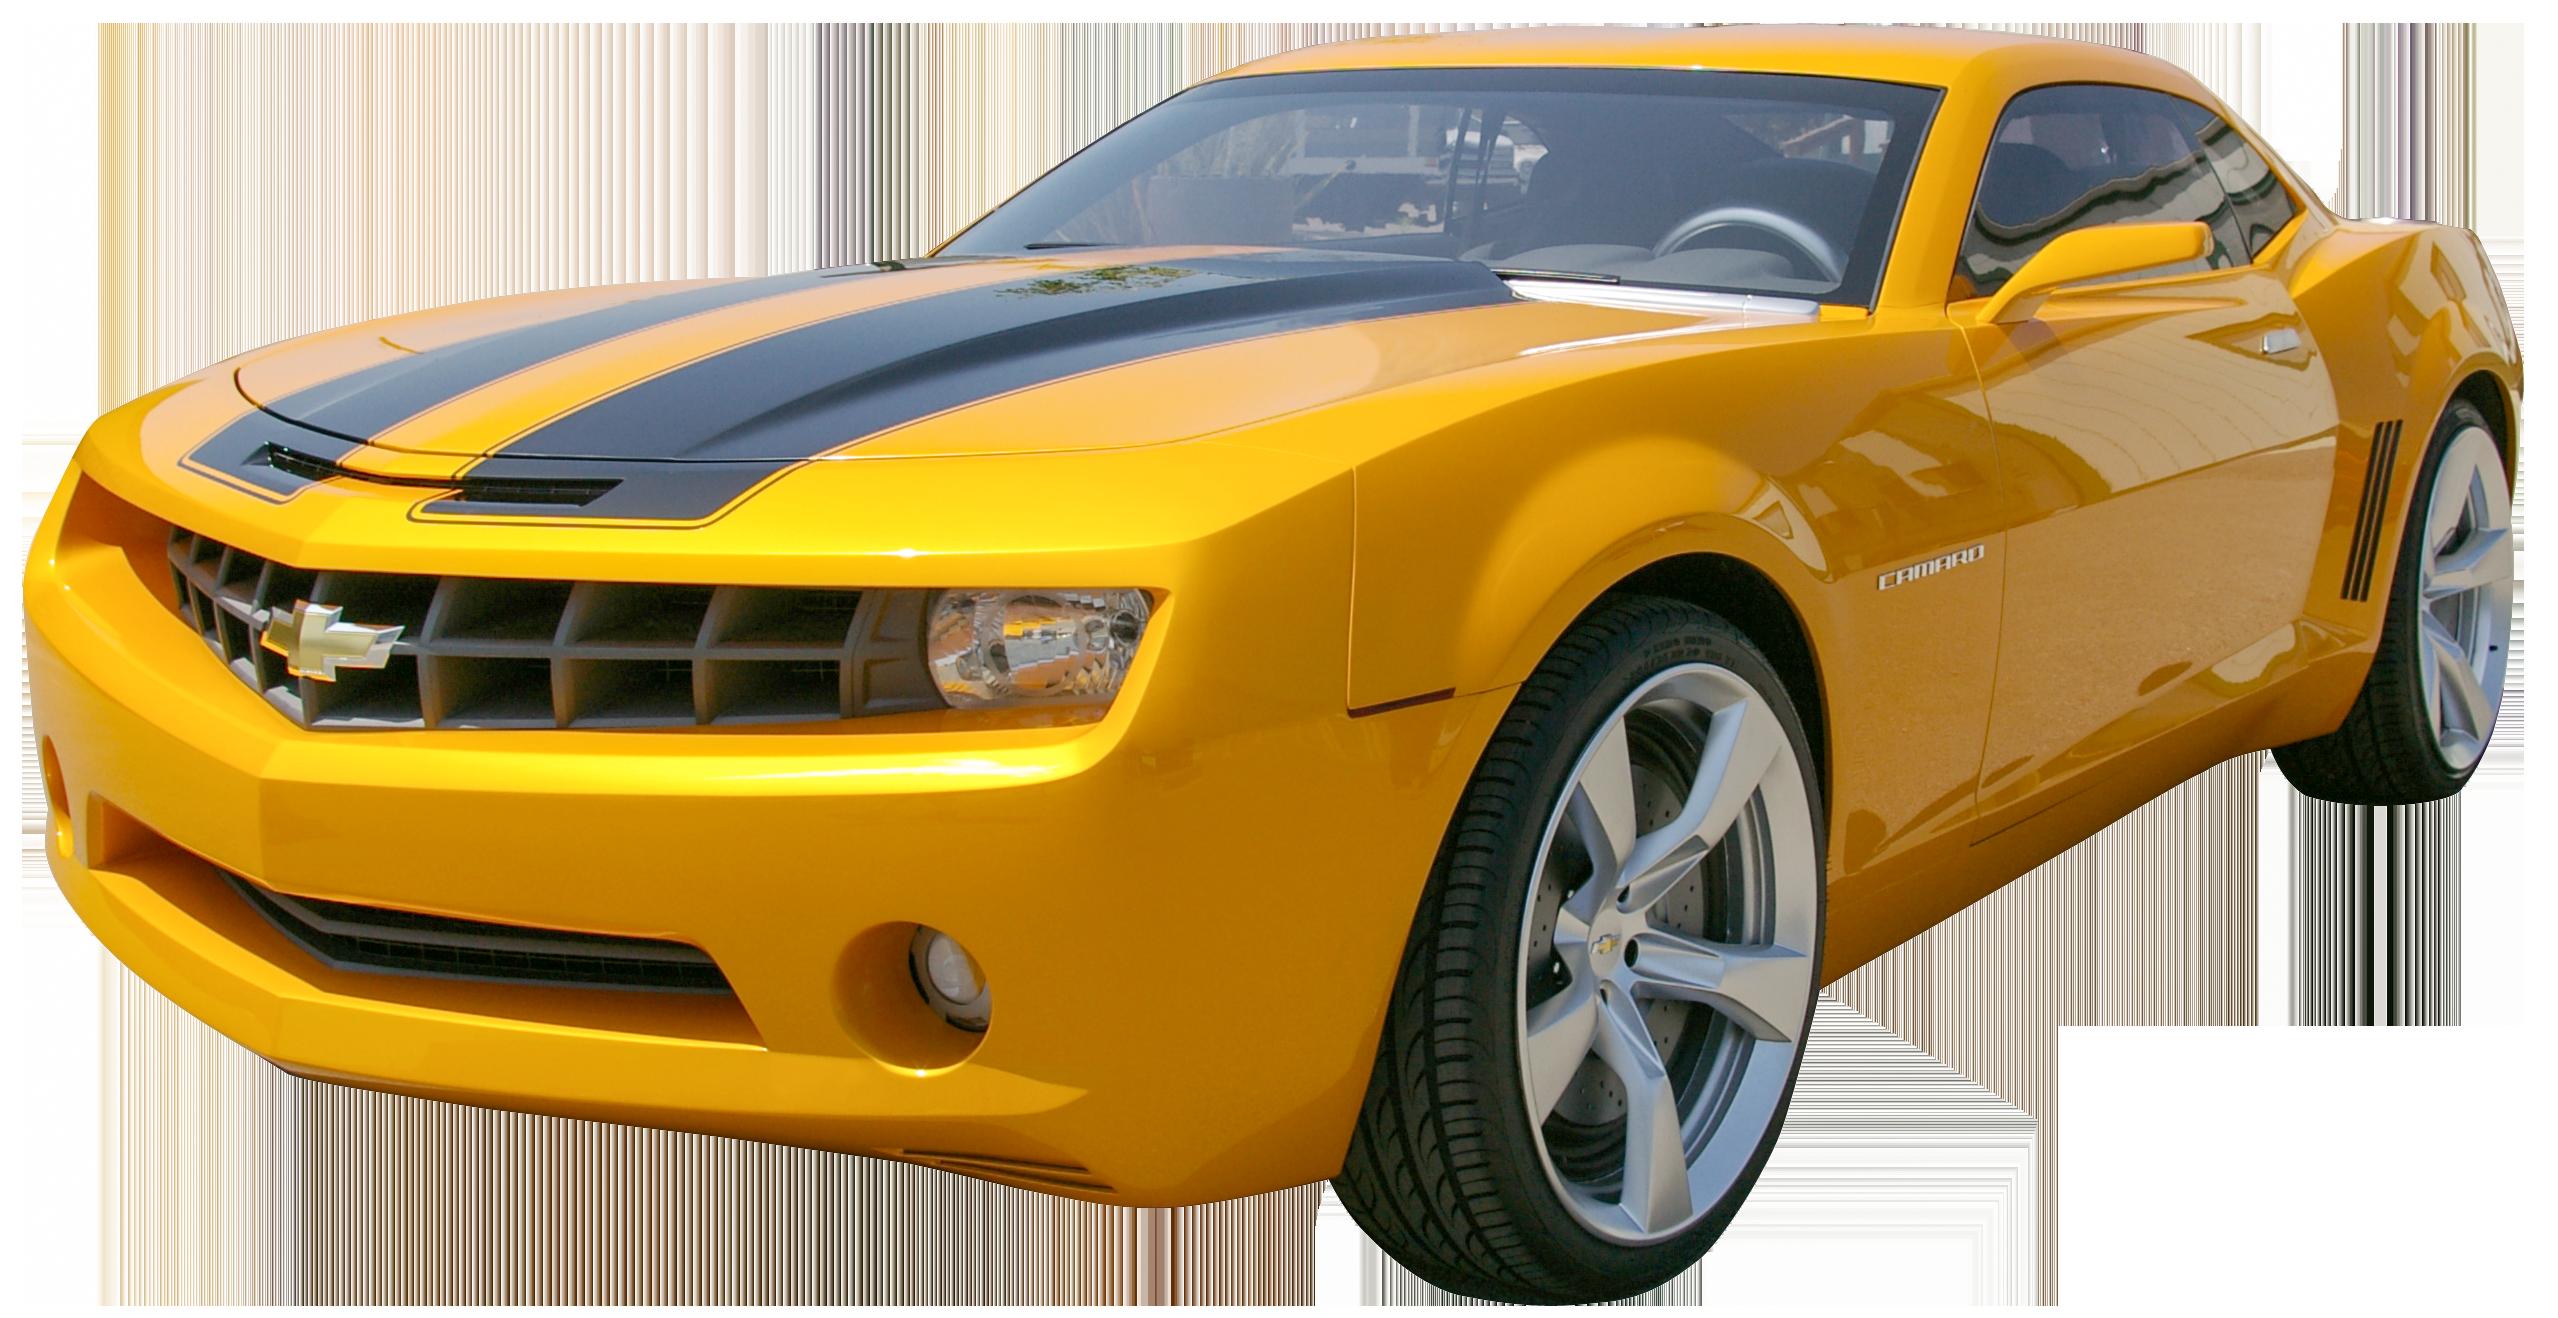 Camaro png clip art. Clipart cars yellow